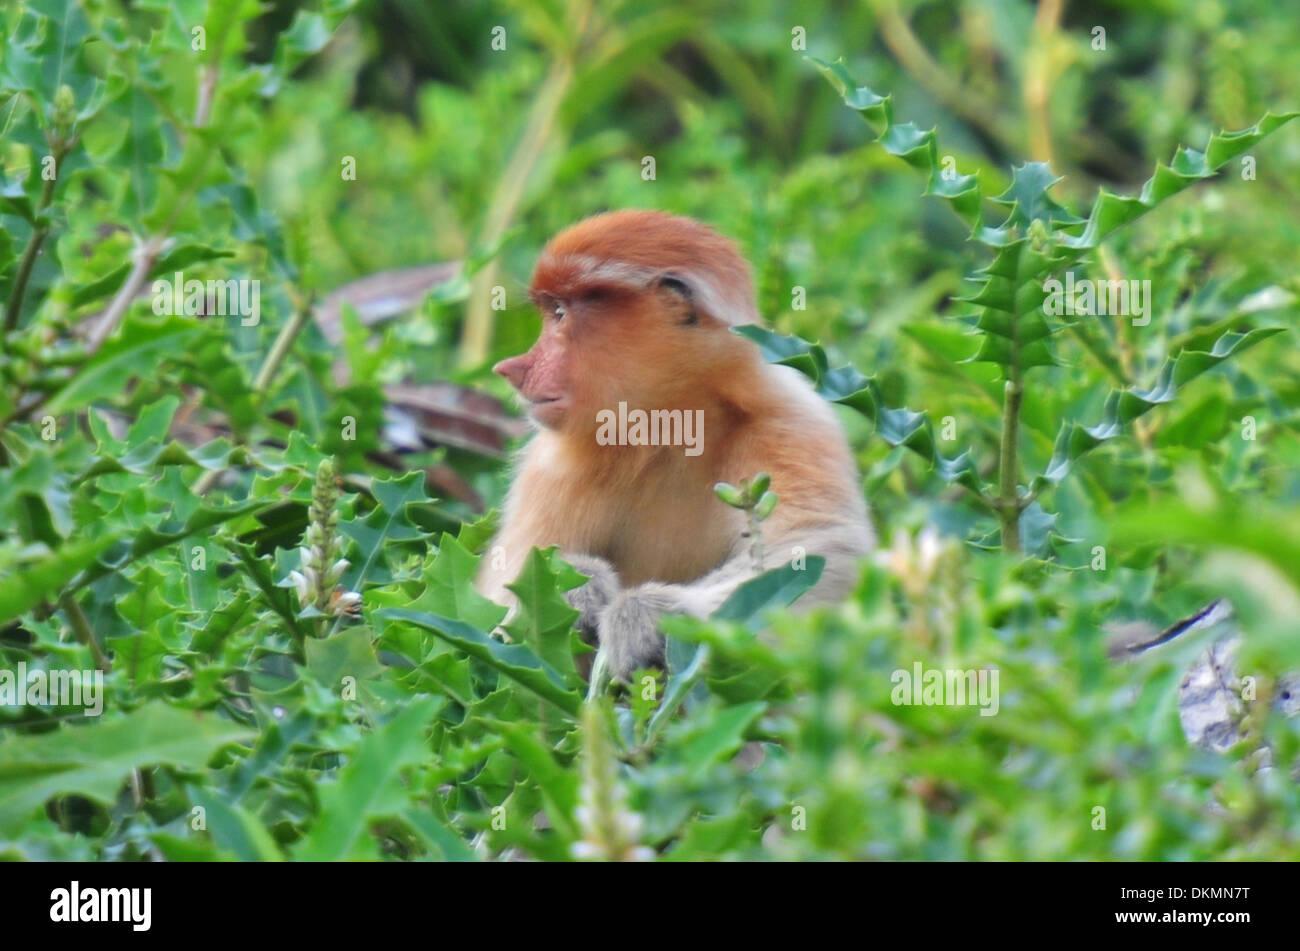 Proboscis monkey (Nasalis larvatus) - Brunei - Stock Image